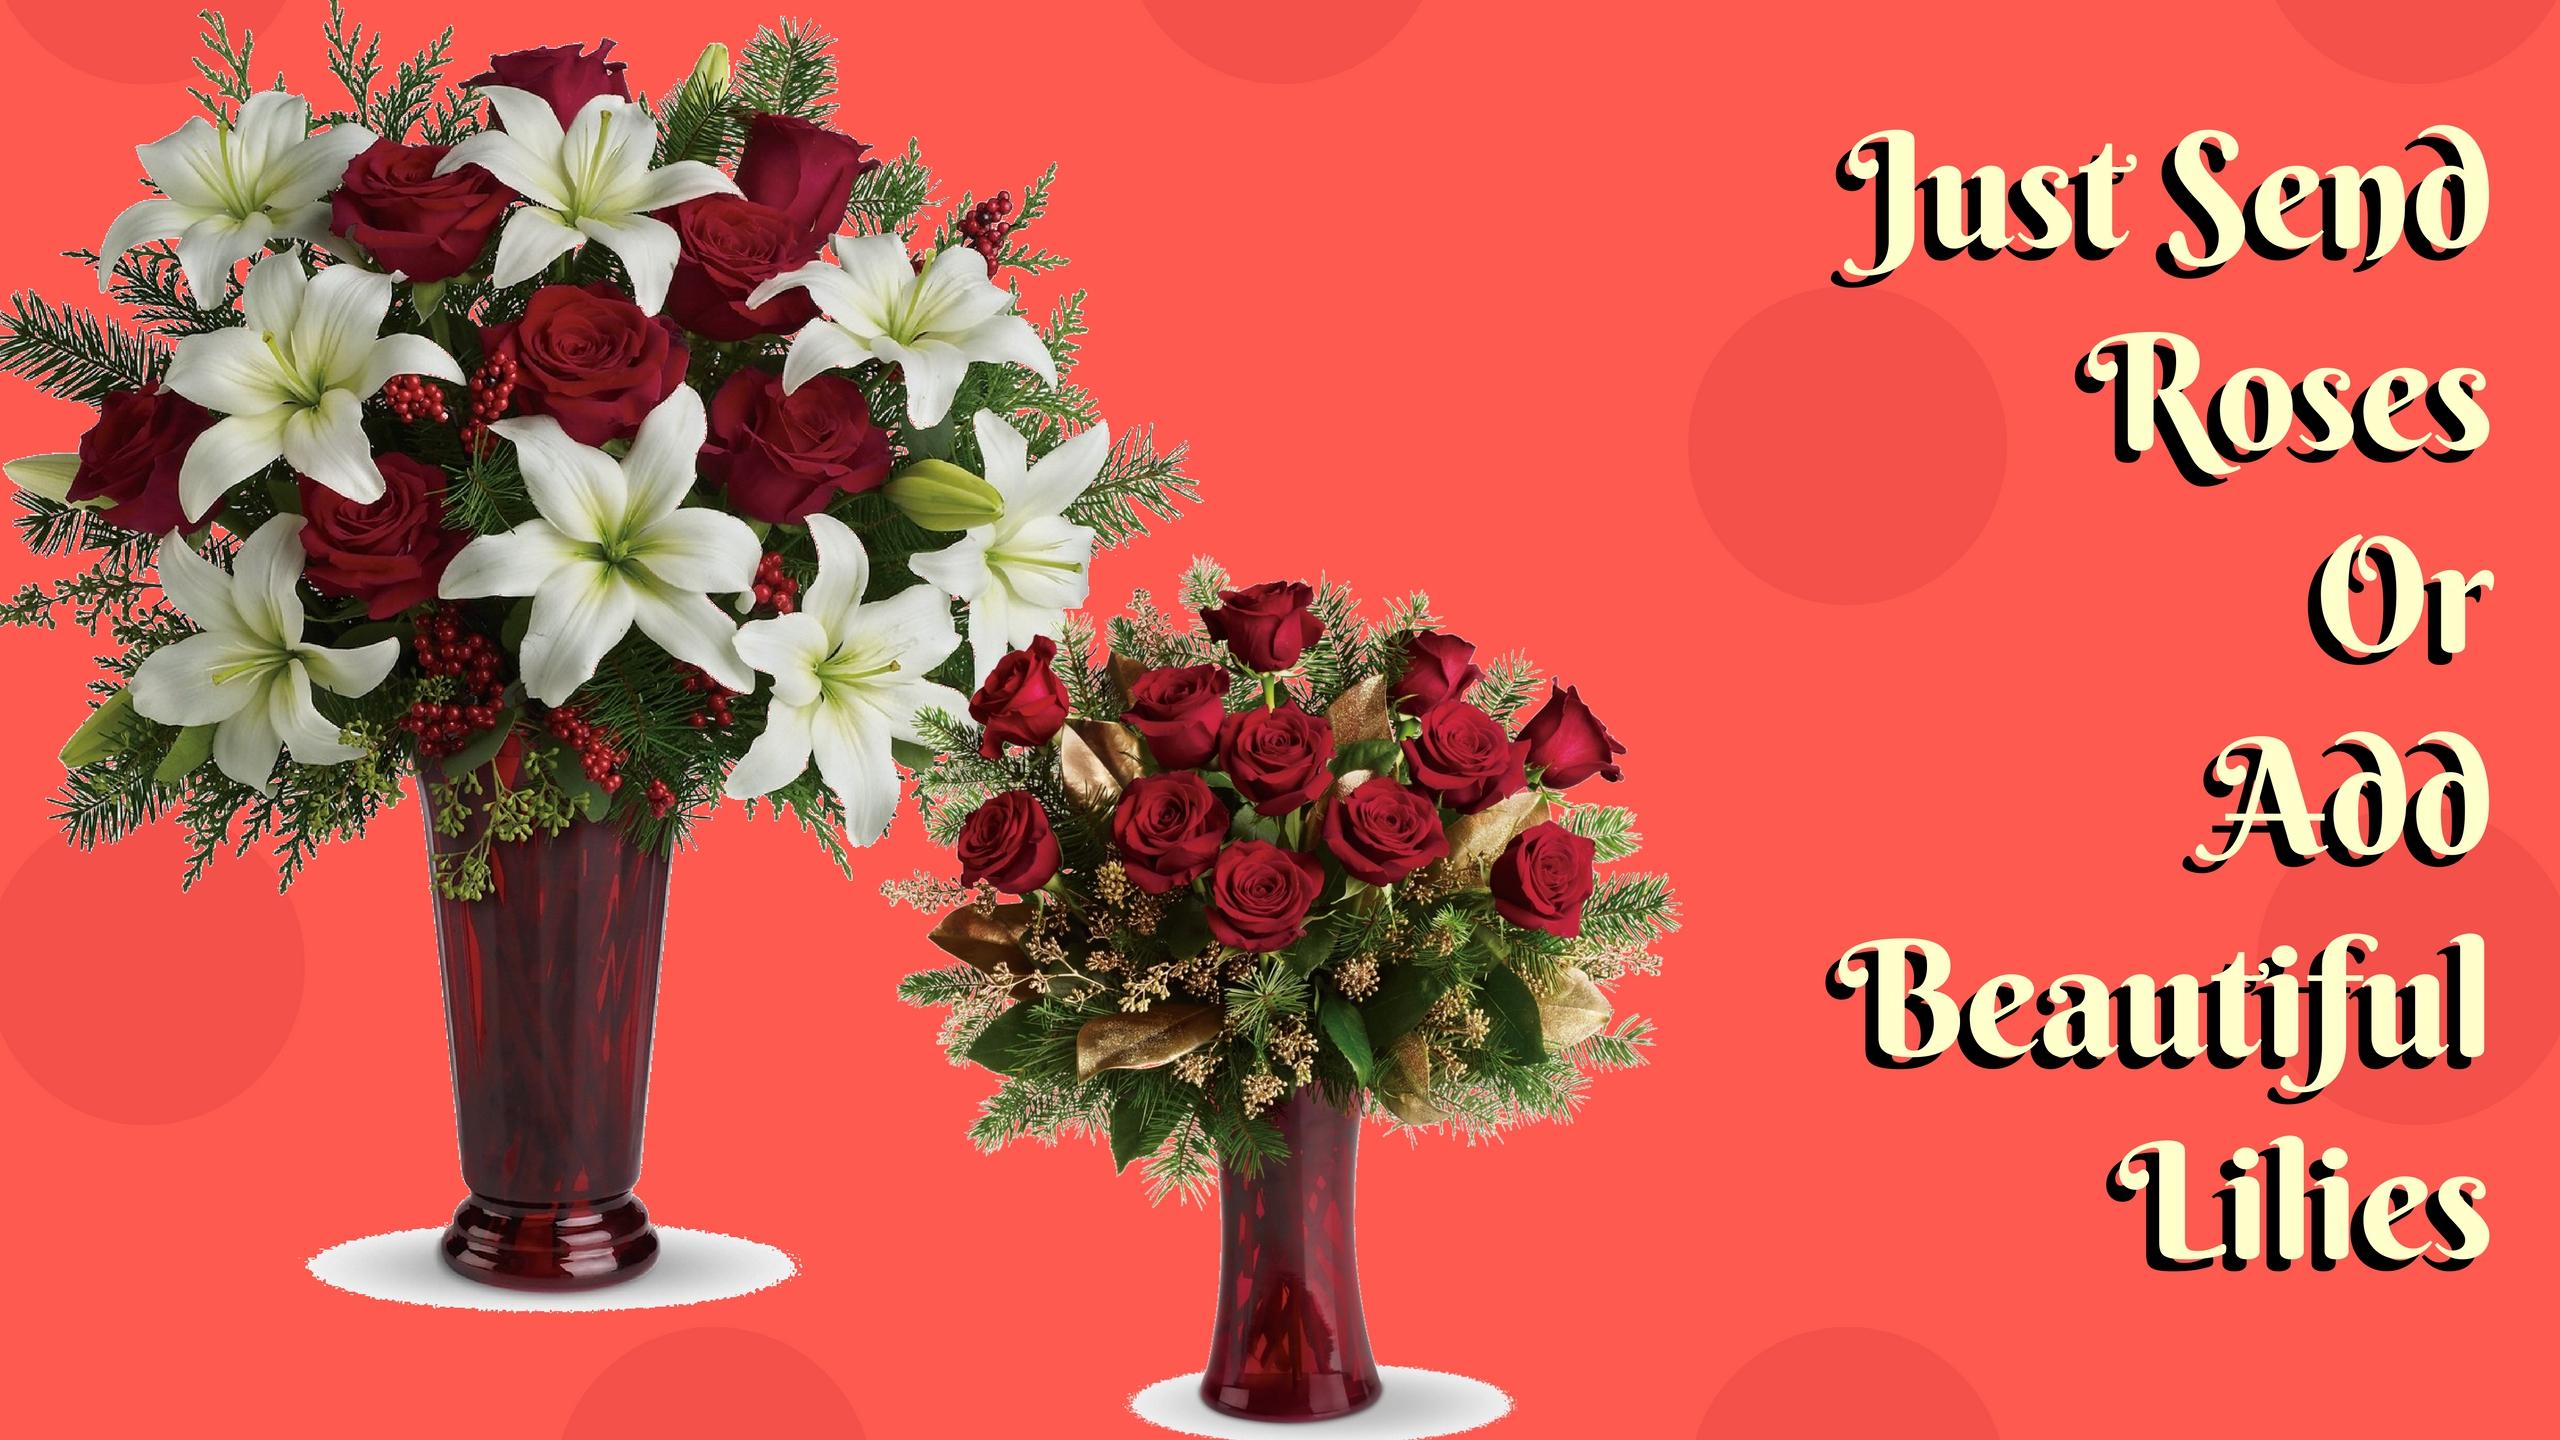 Tis The Season For Delivering Festive Christmas Floral Arrangements